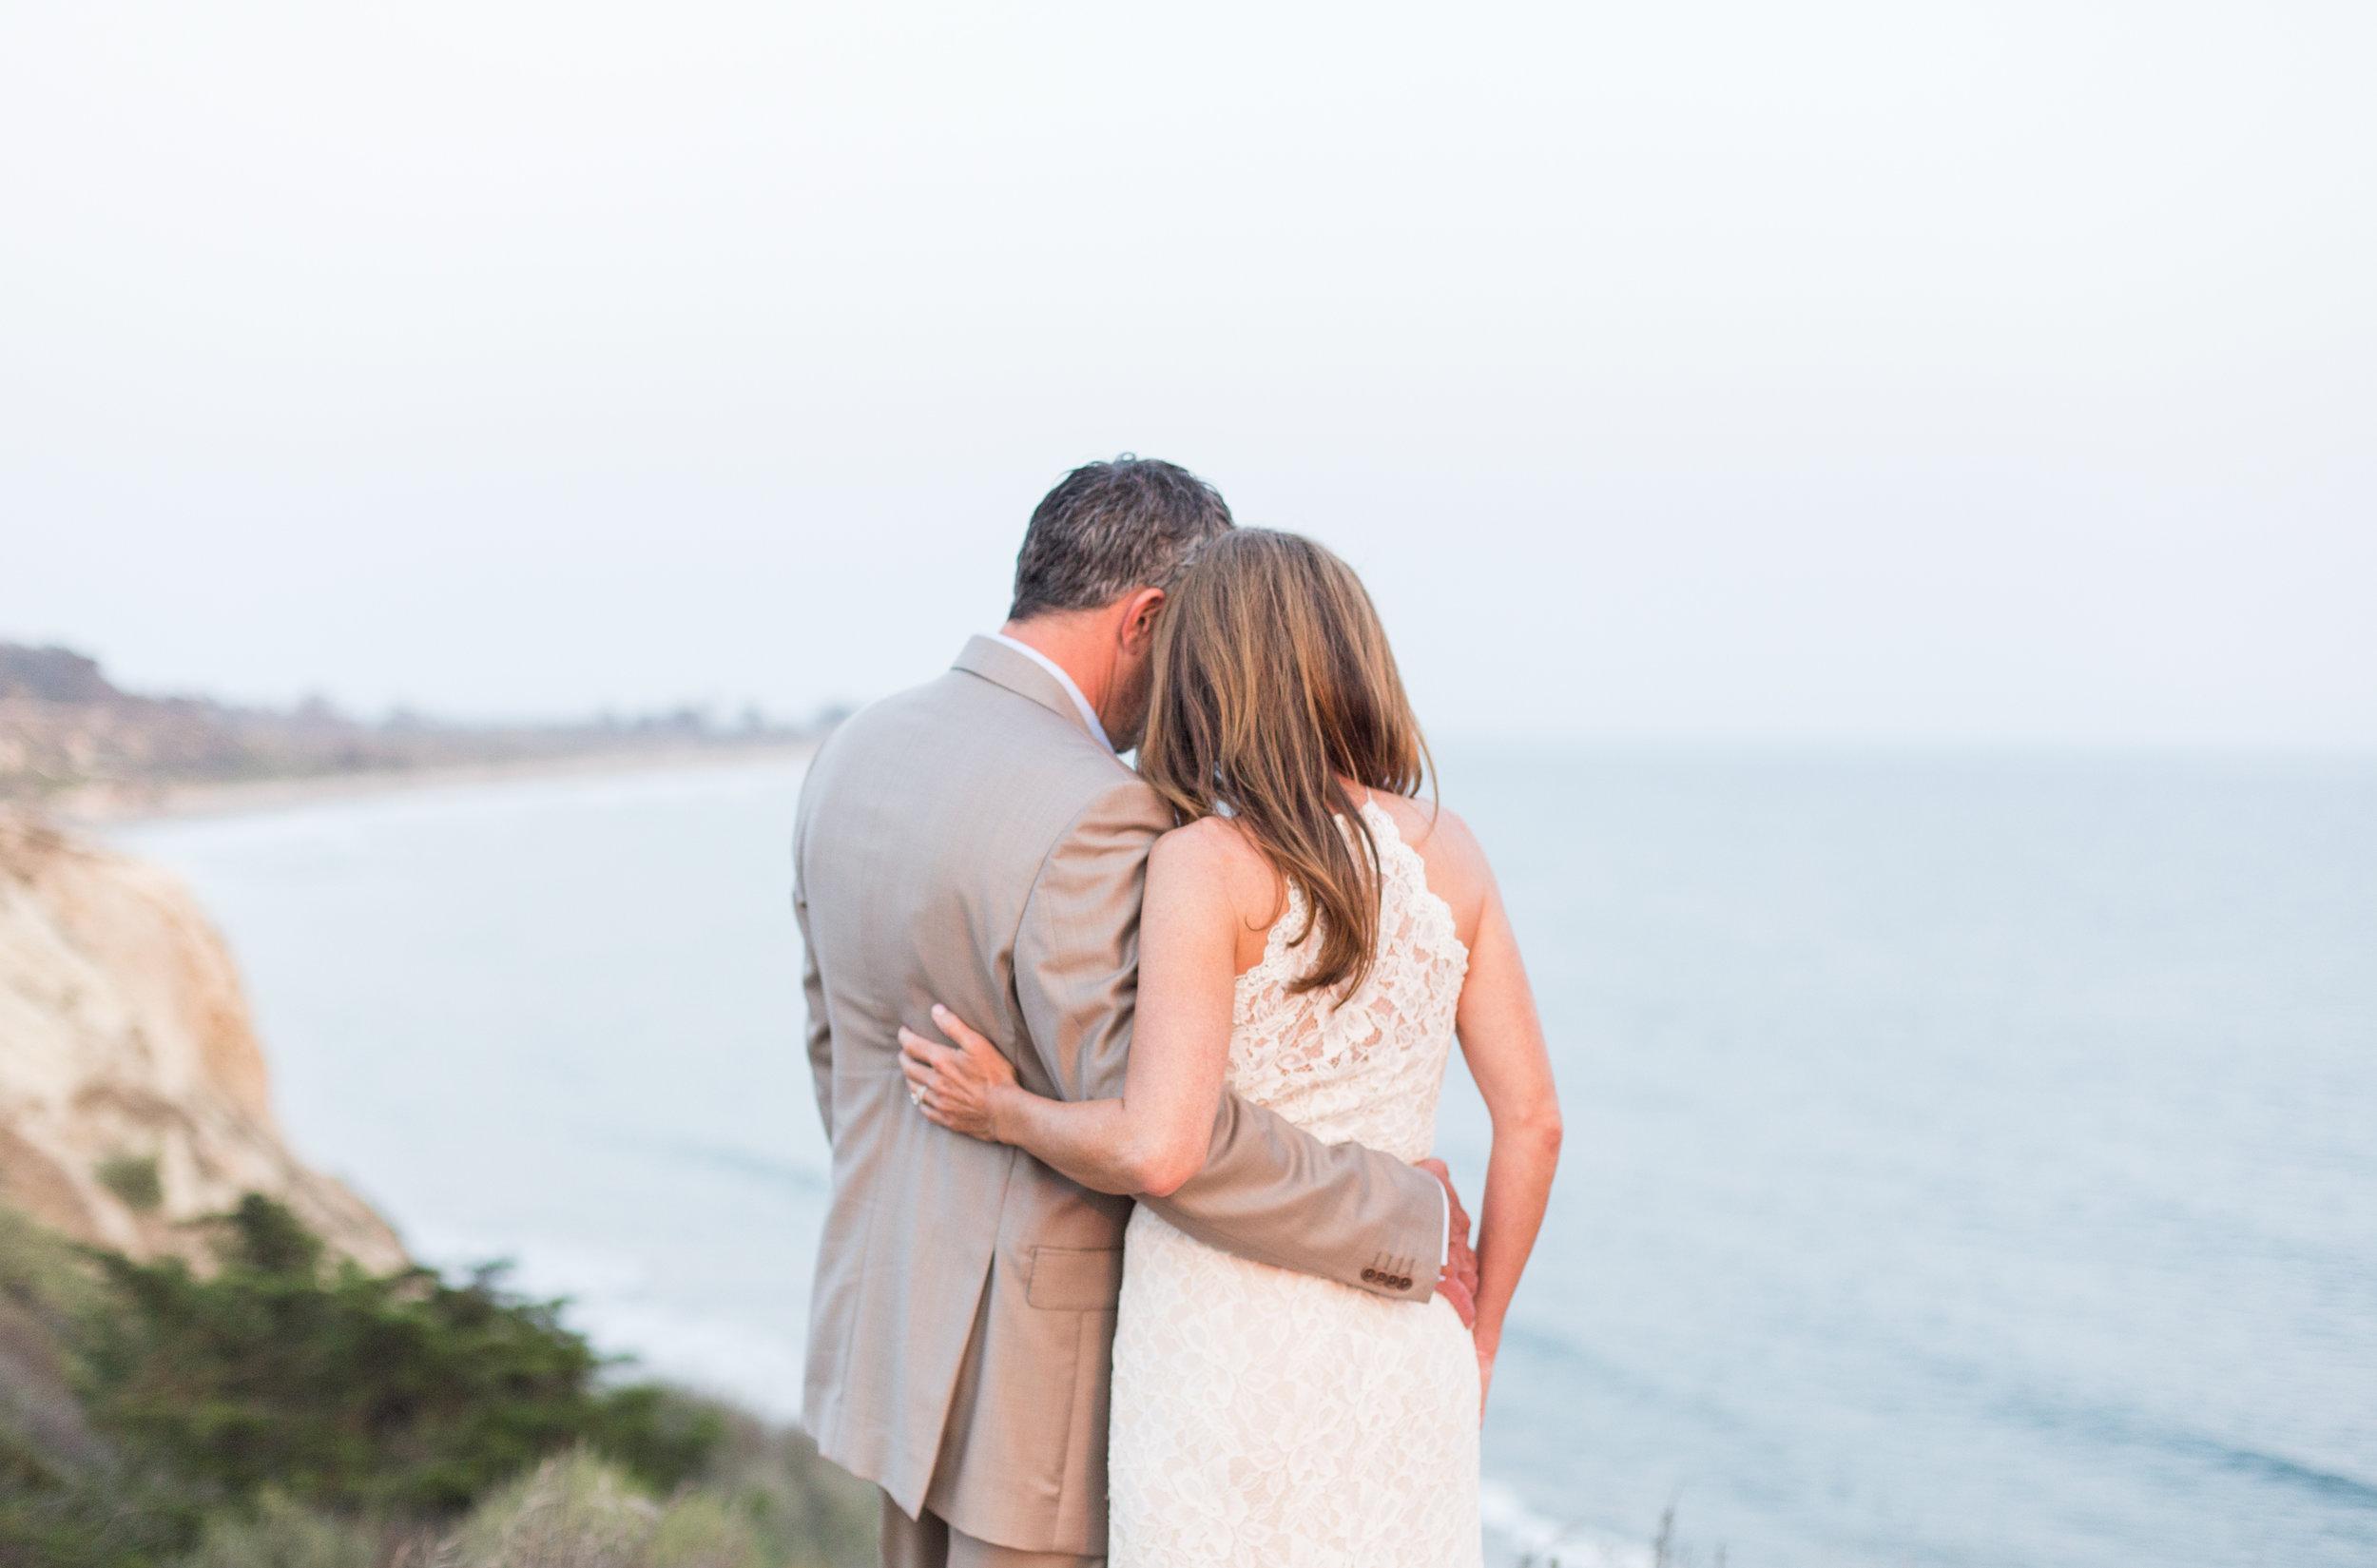 santa-barbara-elopement-elope-wedding-planner-coordinator-coordination-day-of-intimate-rustic-ellwood-bluffs-forest-beach-ocean-view-green-white-event (30).jpg